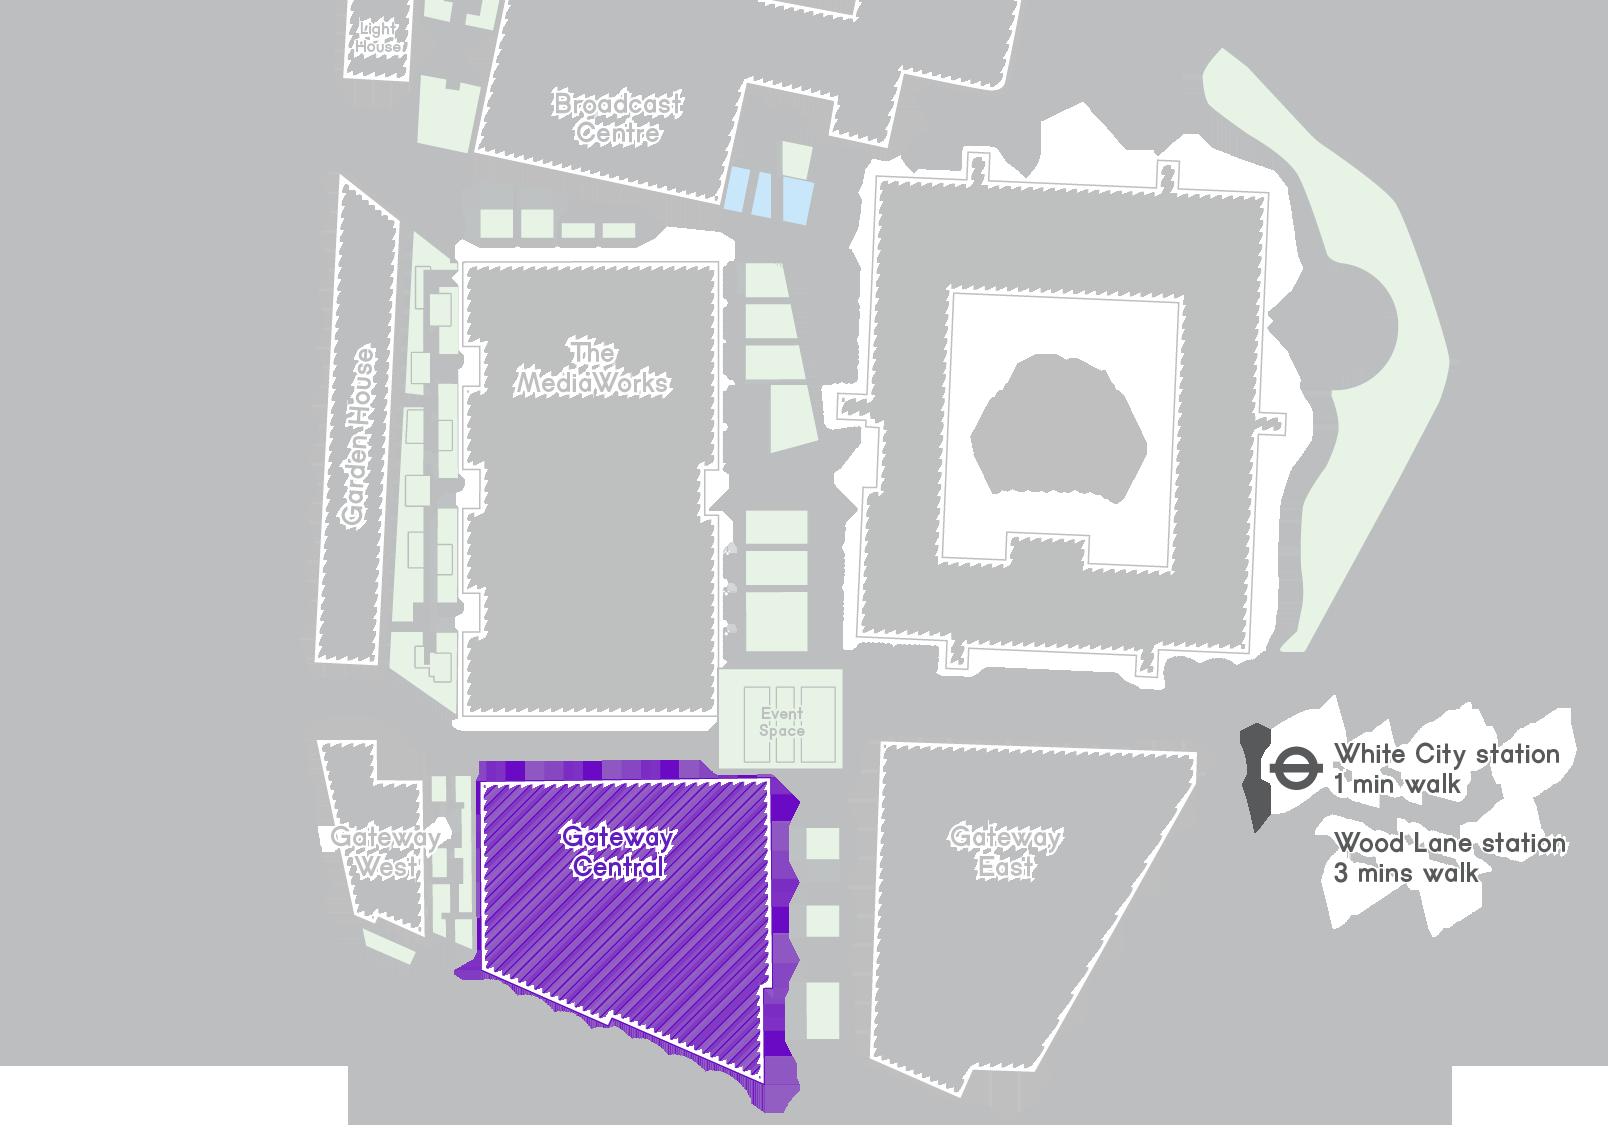 Gateway Central